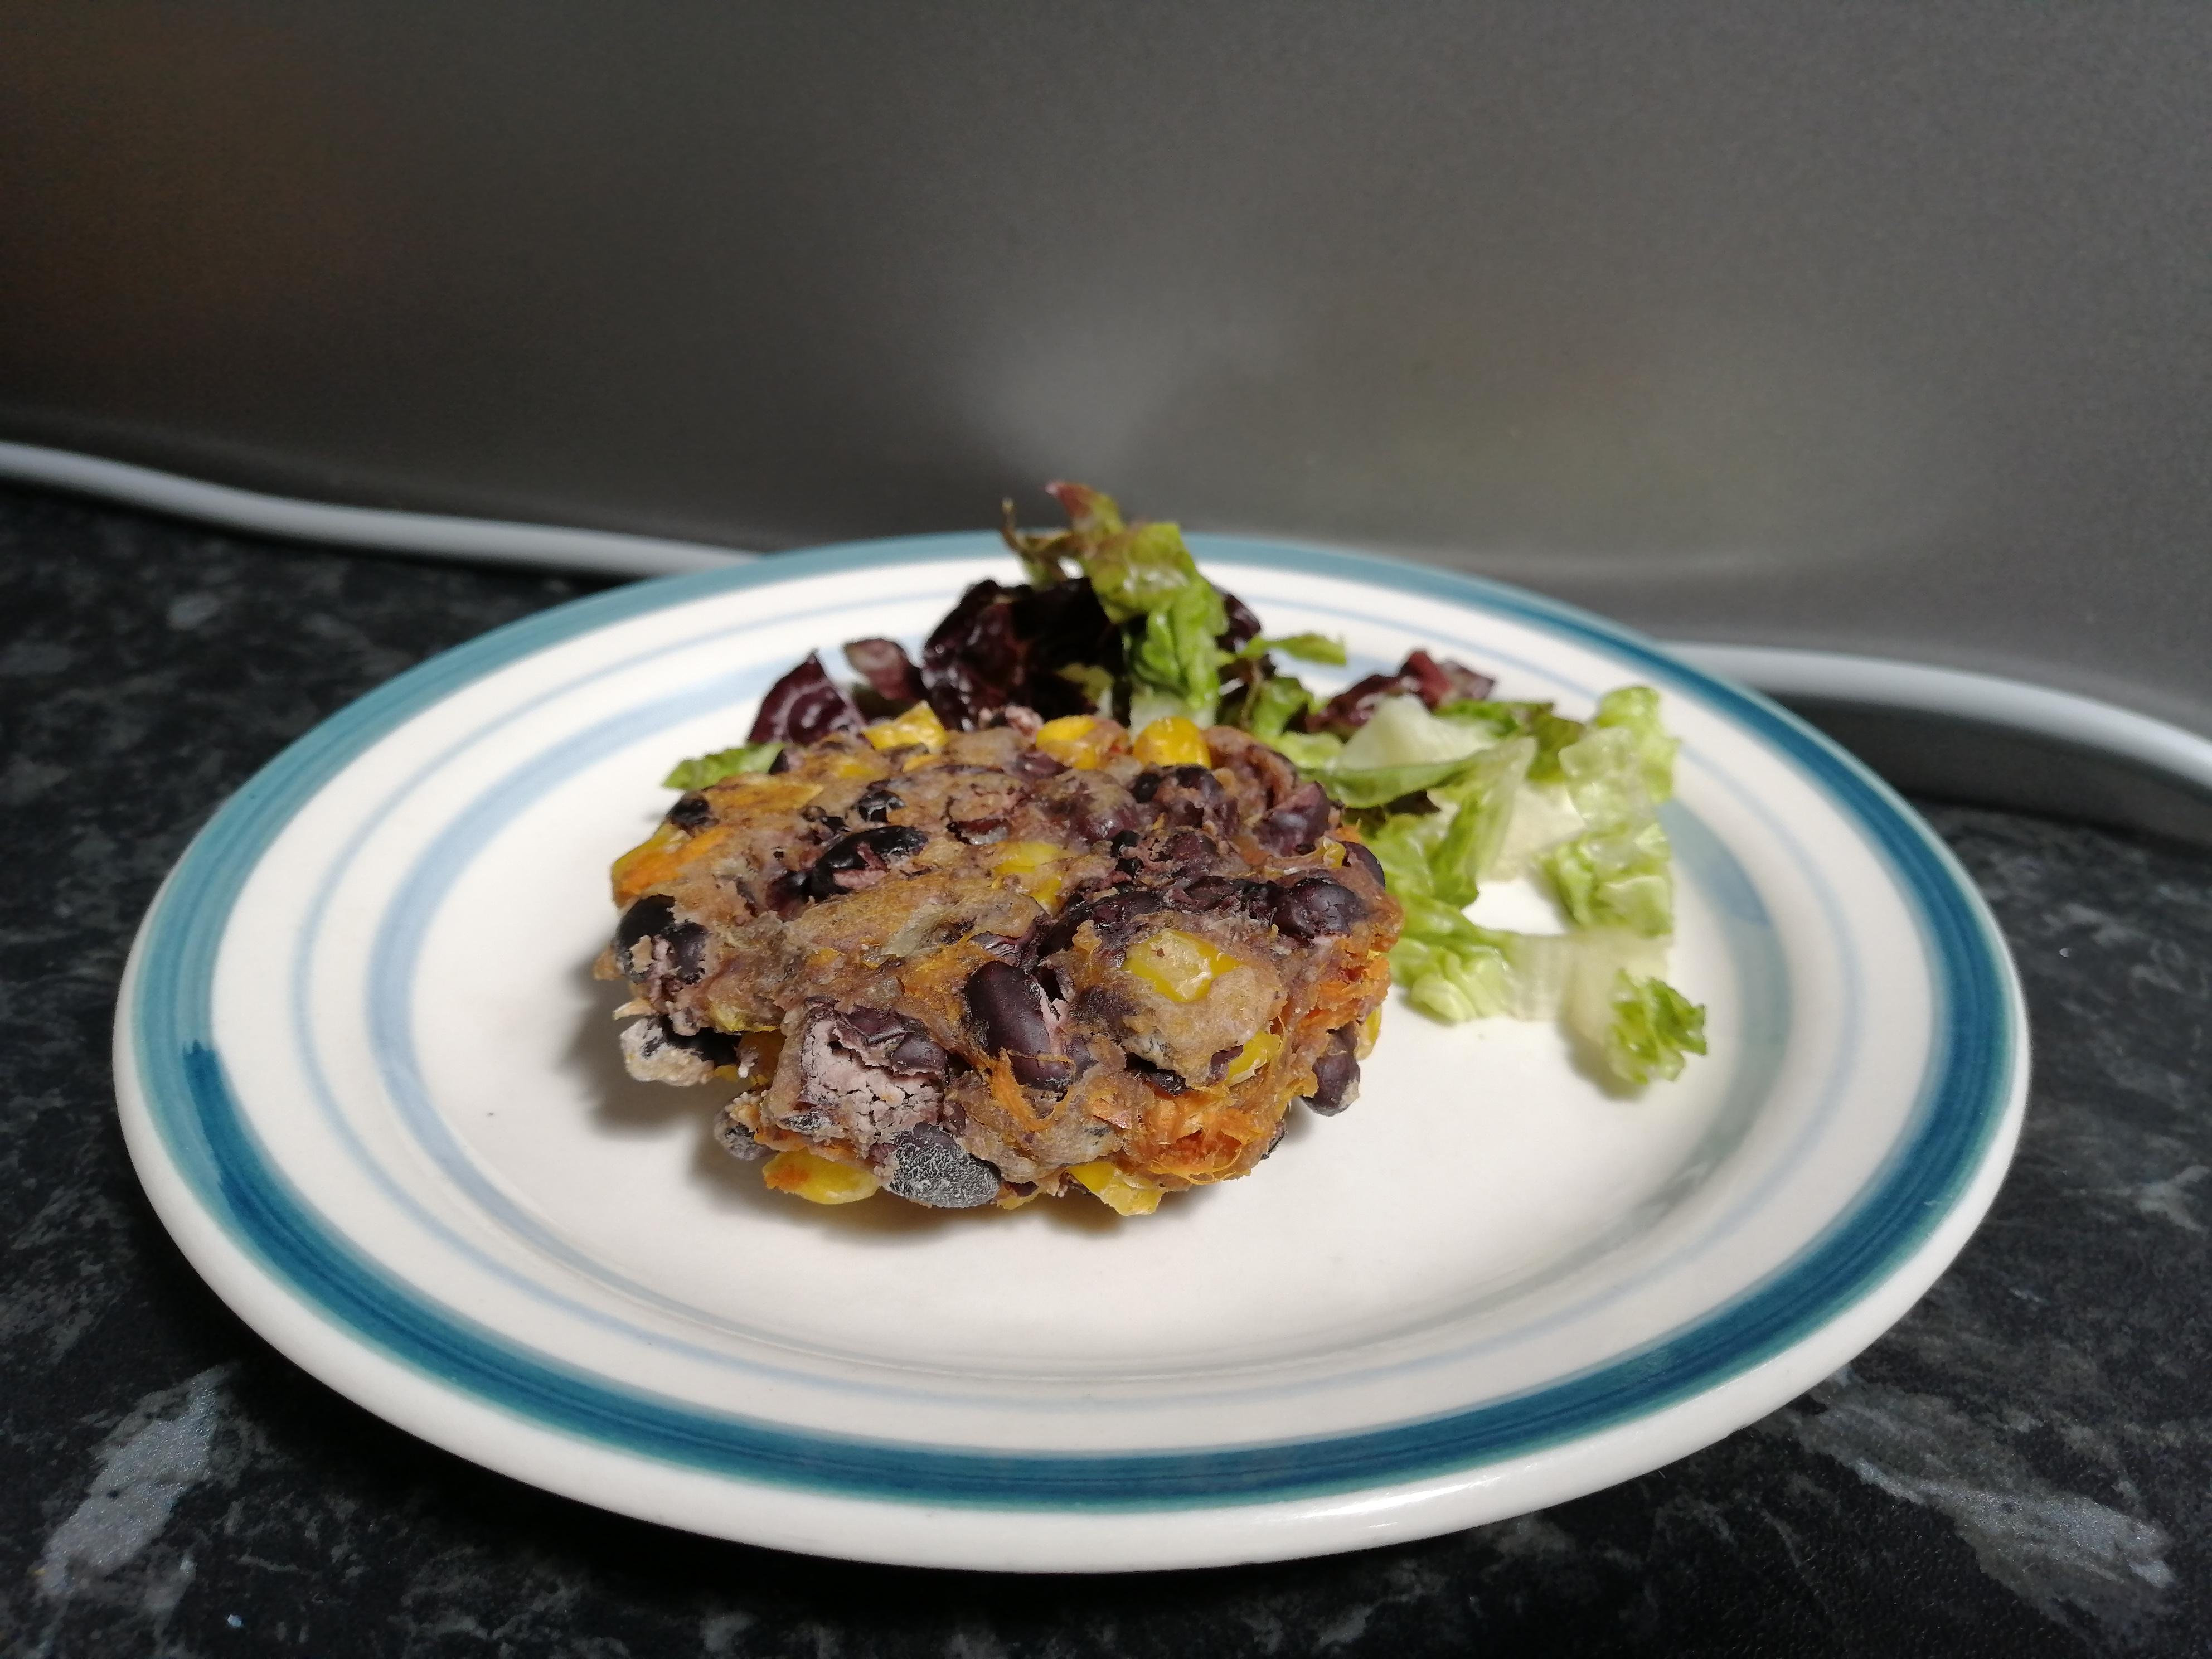 sweet-potato-and-black-bean-burger